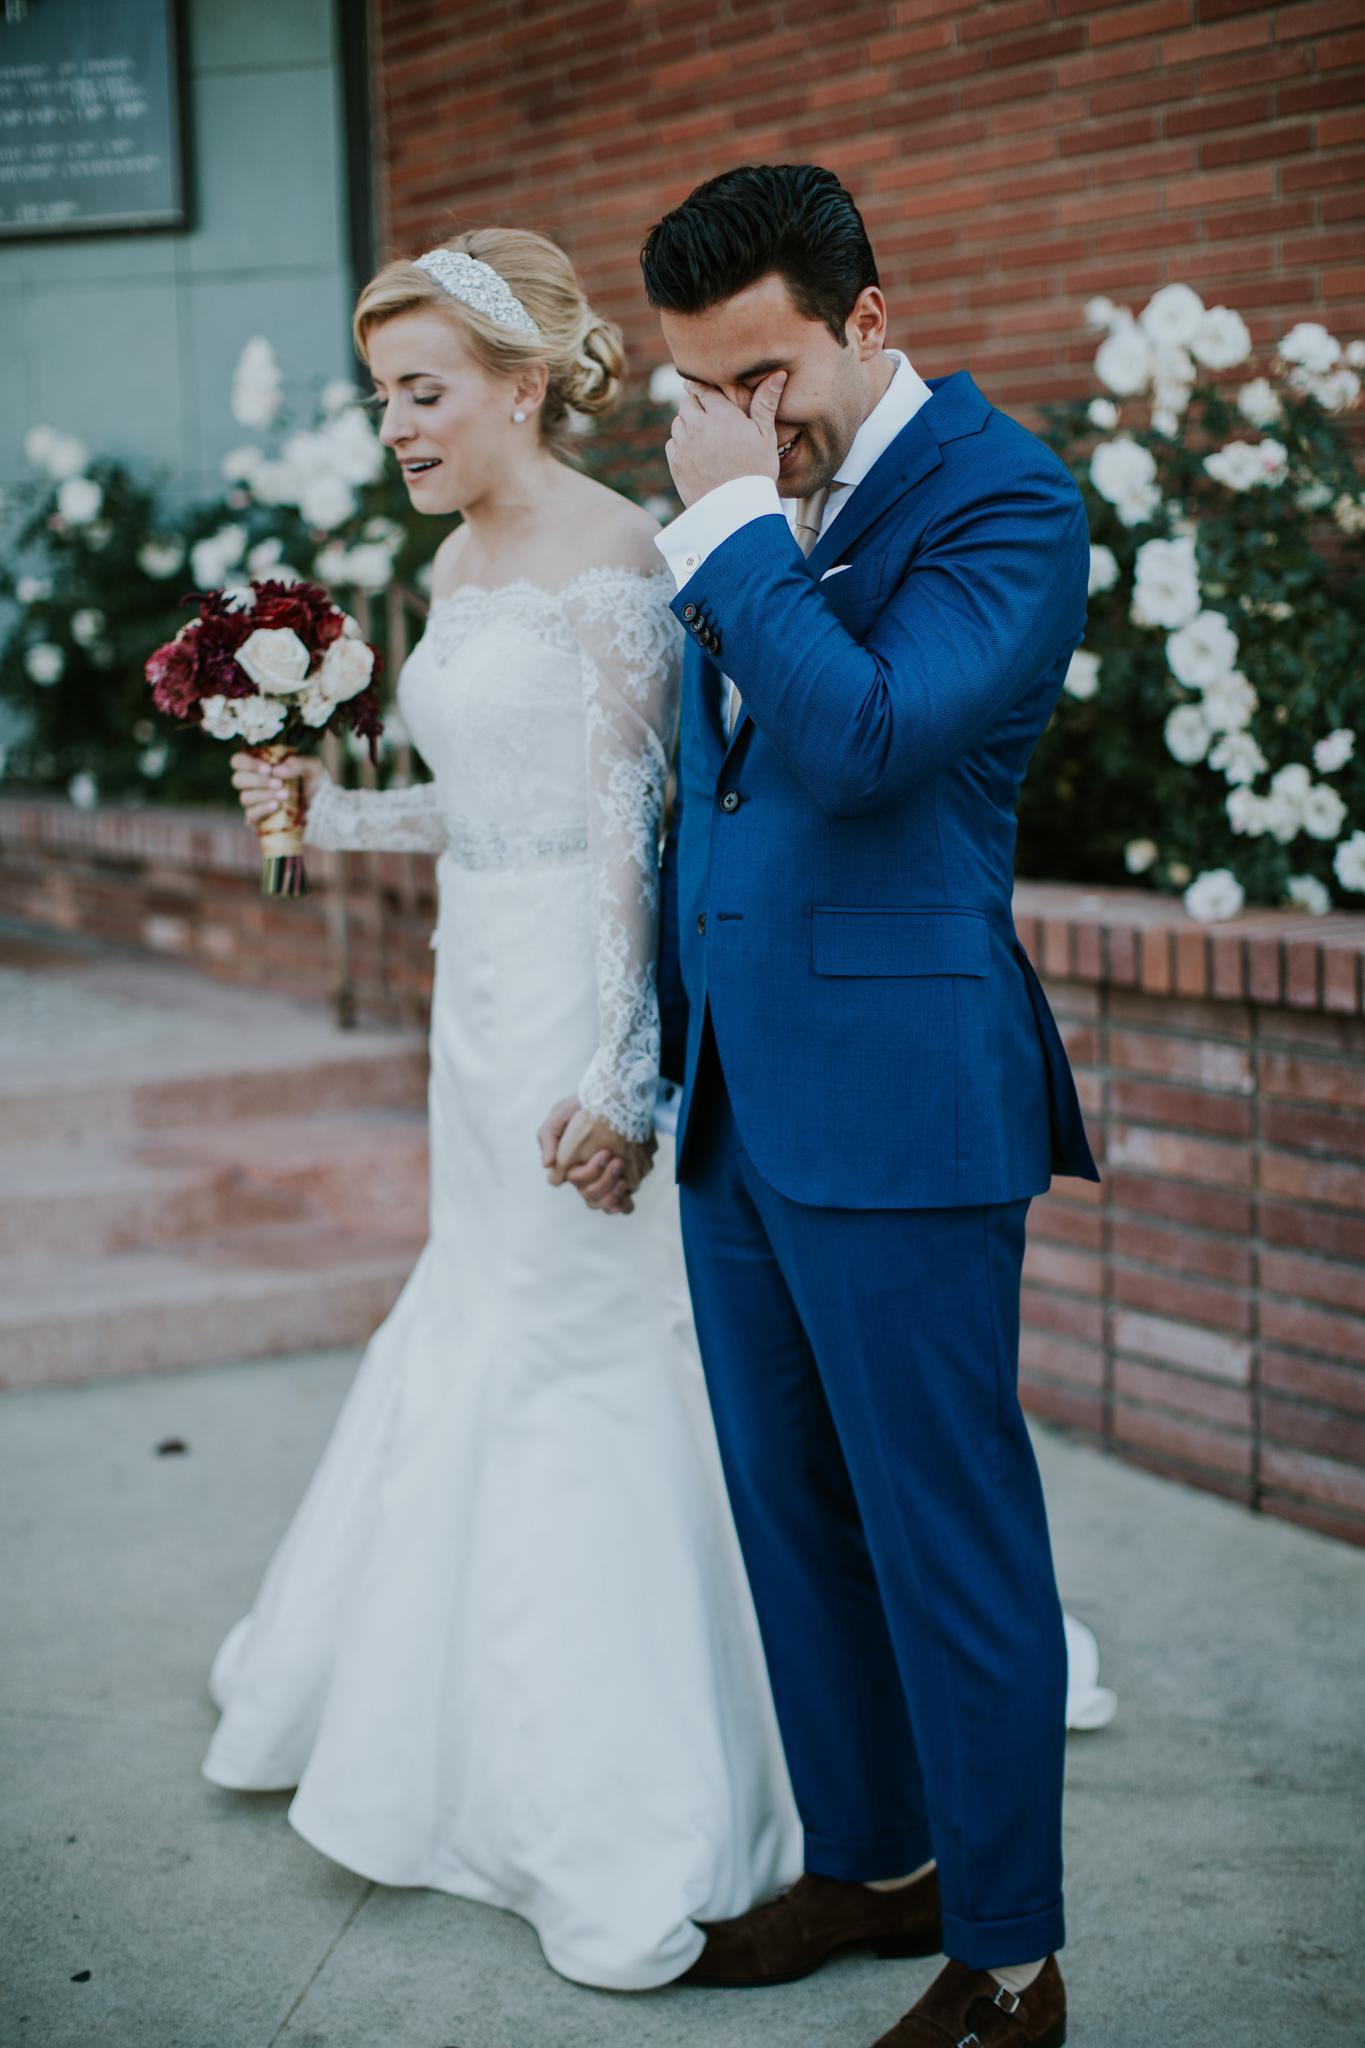 20151230_hussem_wedding_0242_web.jpg